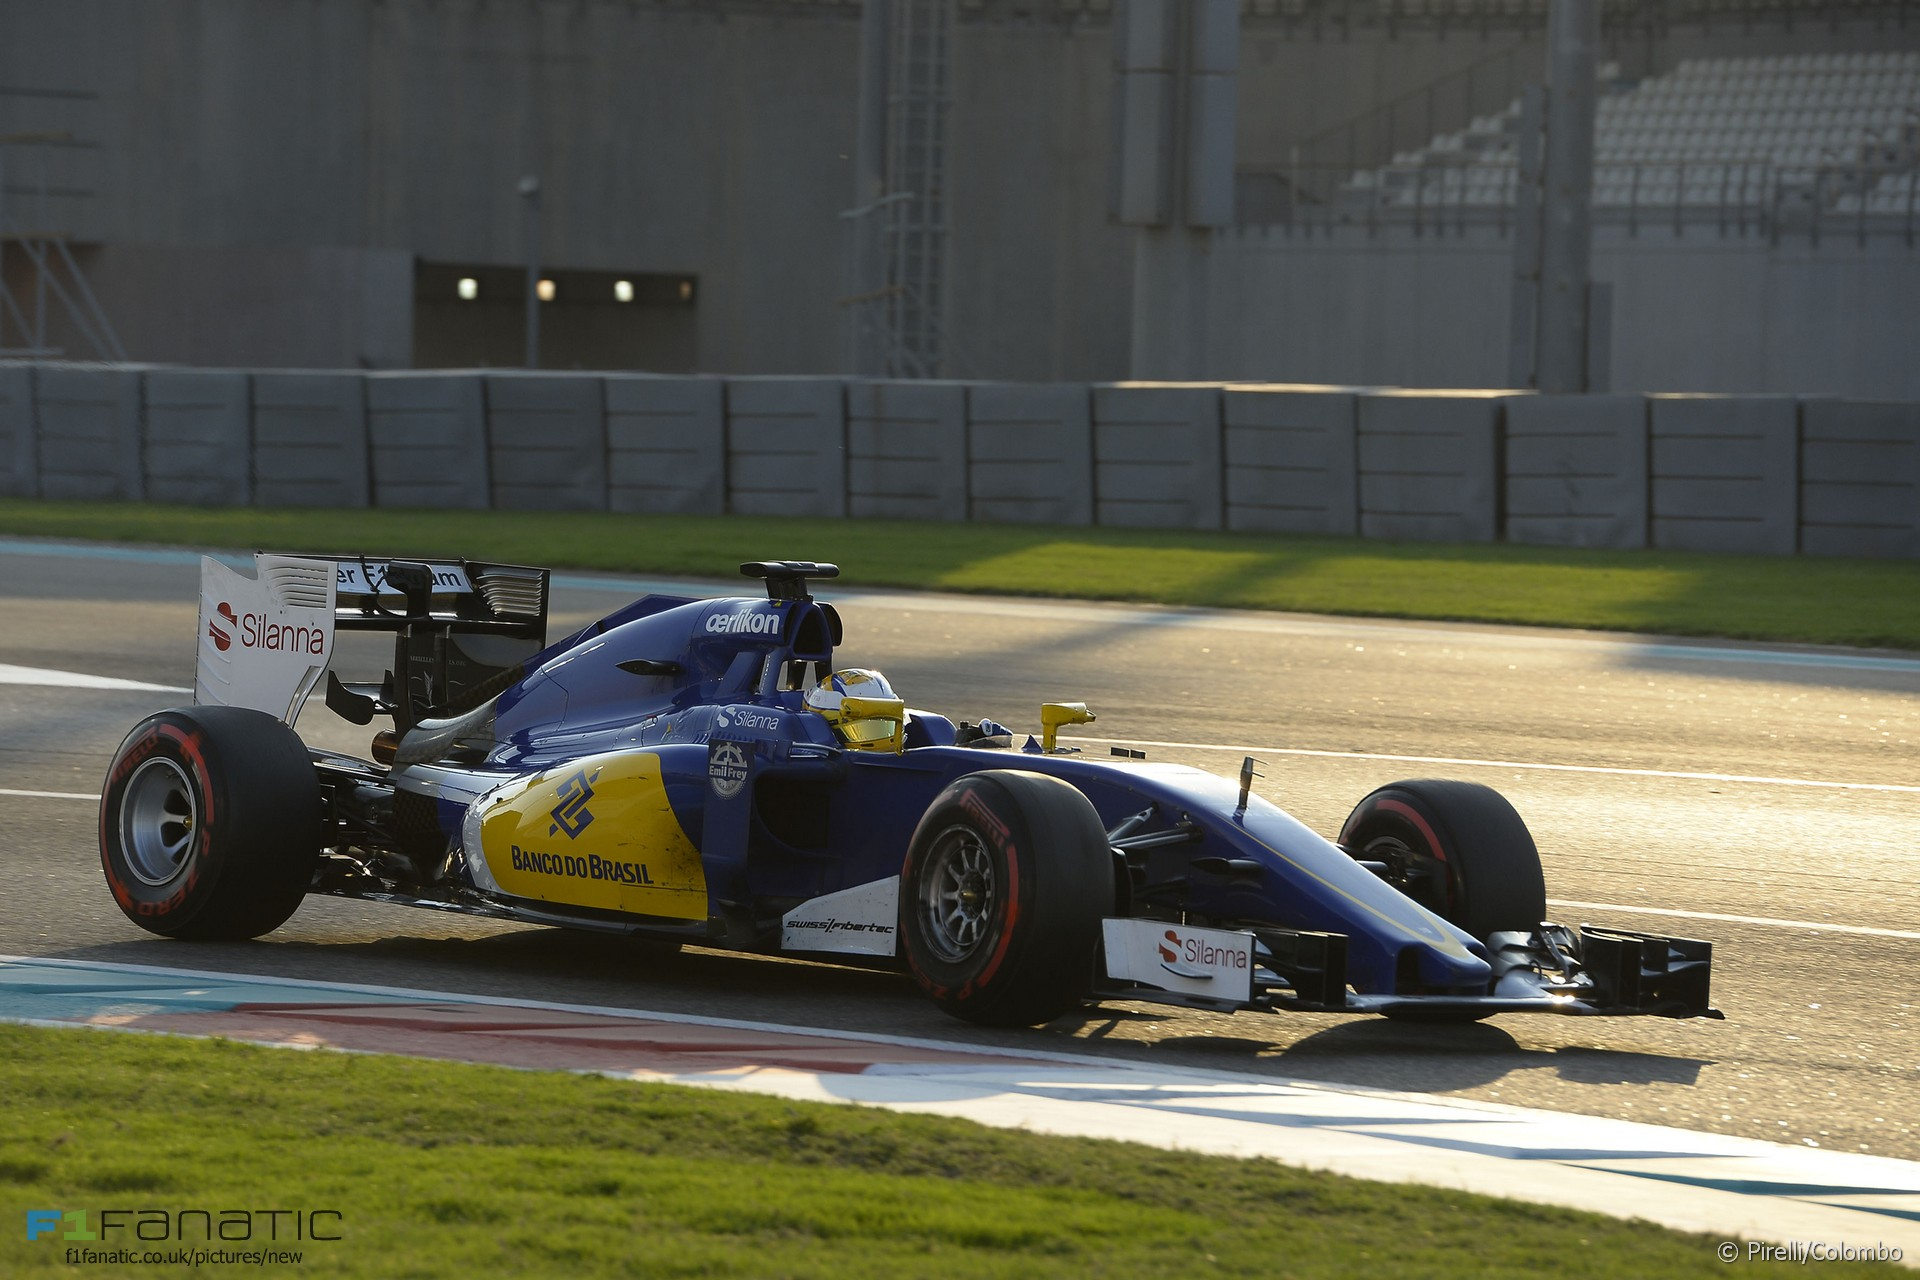 Marcus Ericsson, Sauber, Yas Marina, 2015